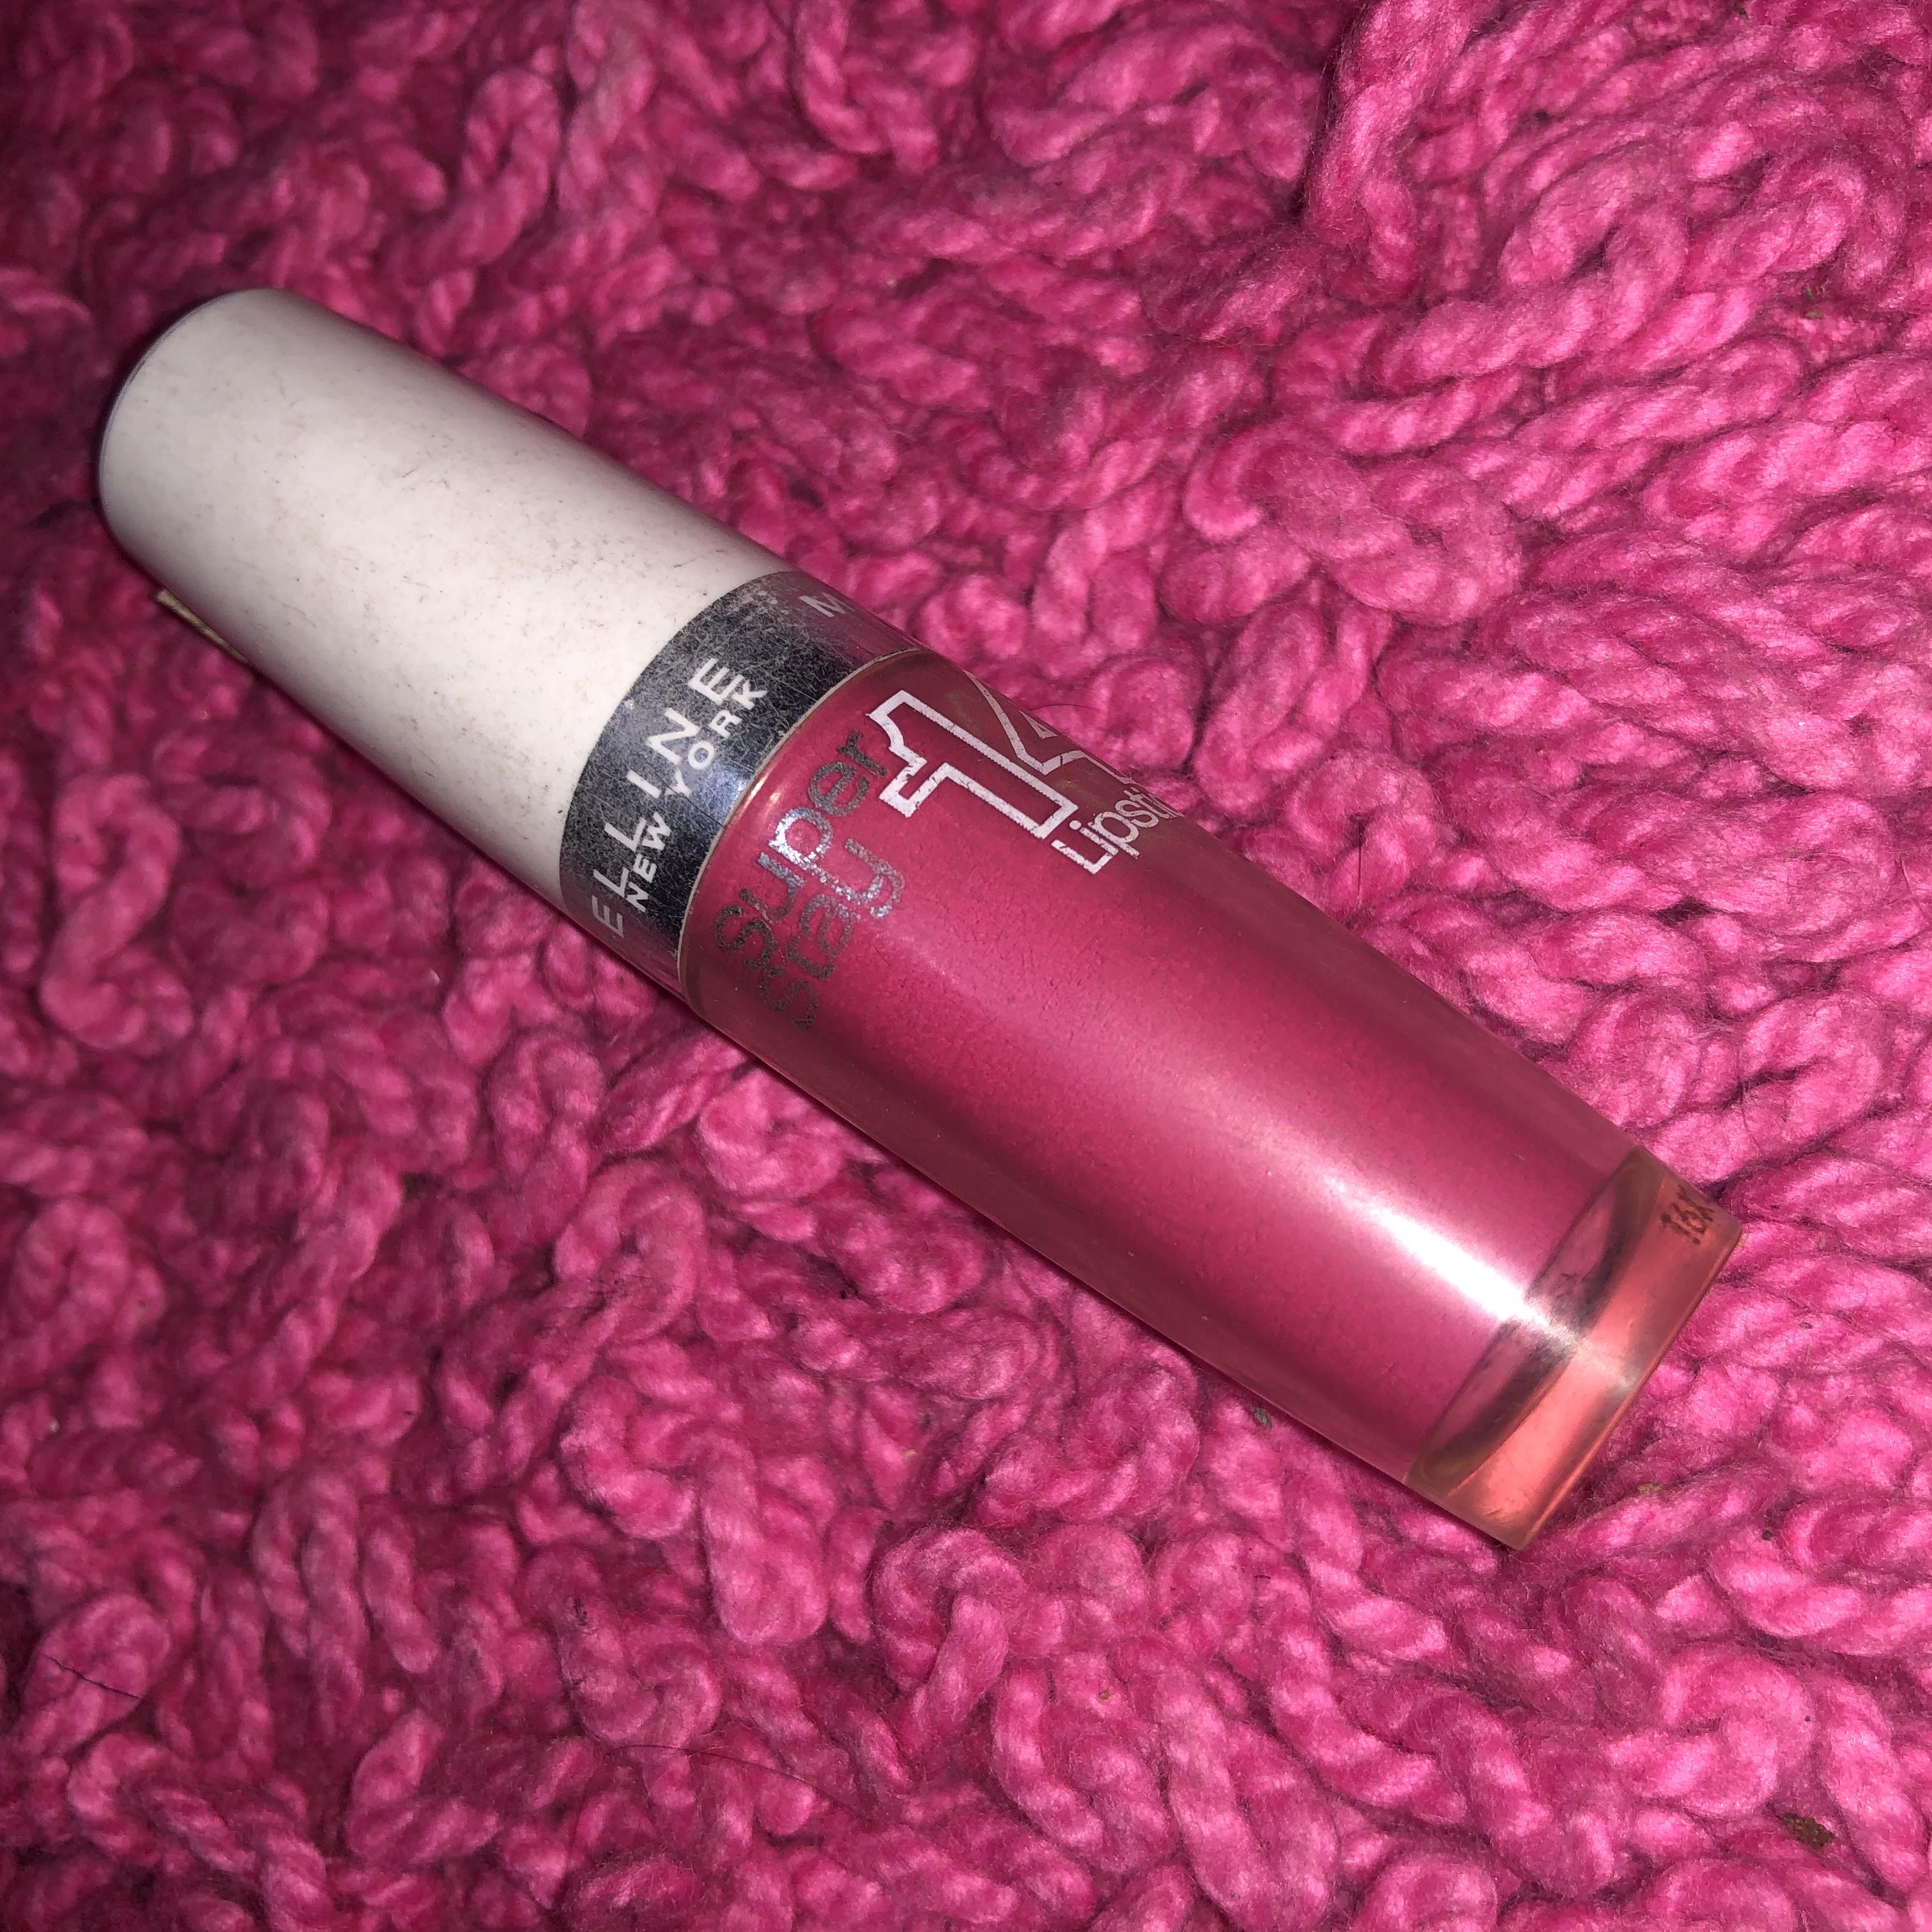 Maybelline New York Superstay 14H Megawatt -One of my favourite lipsticks-By aishwaryaaaa